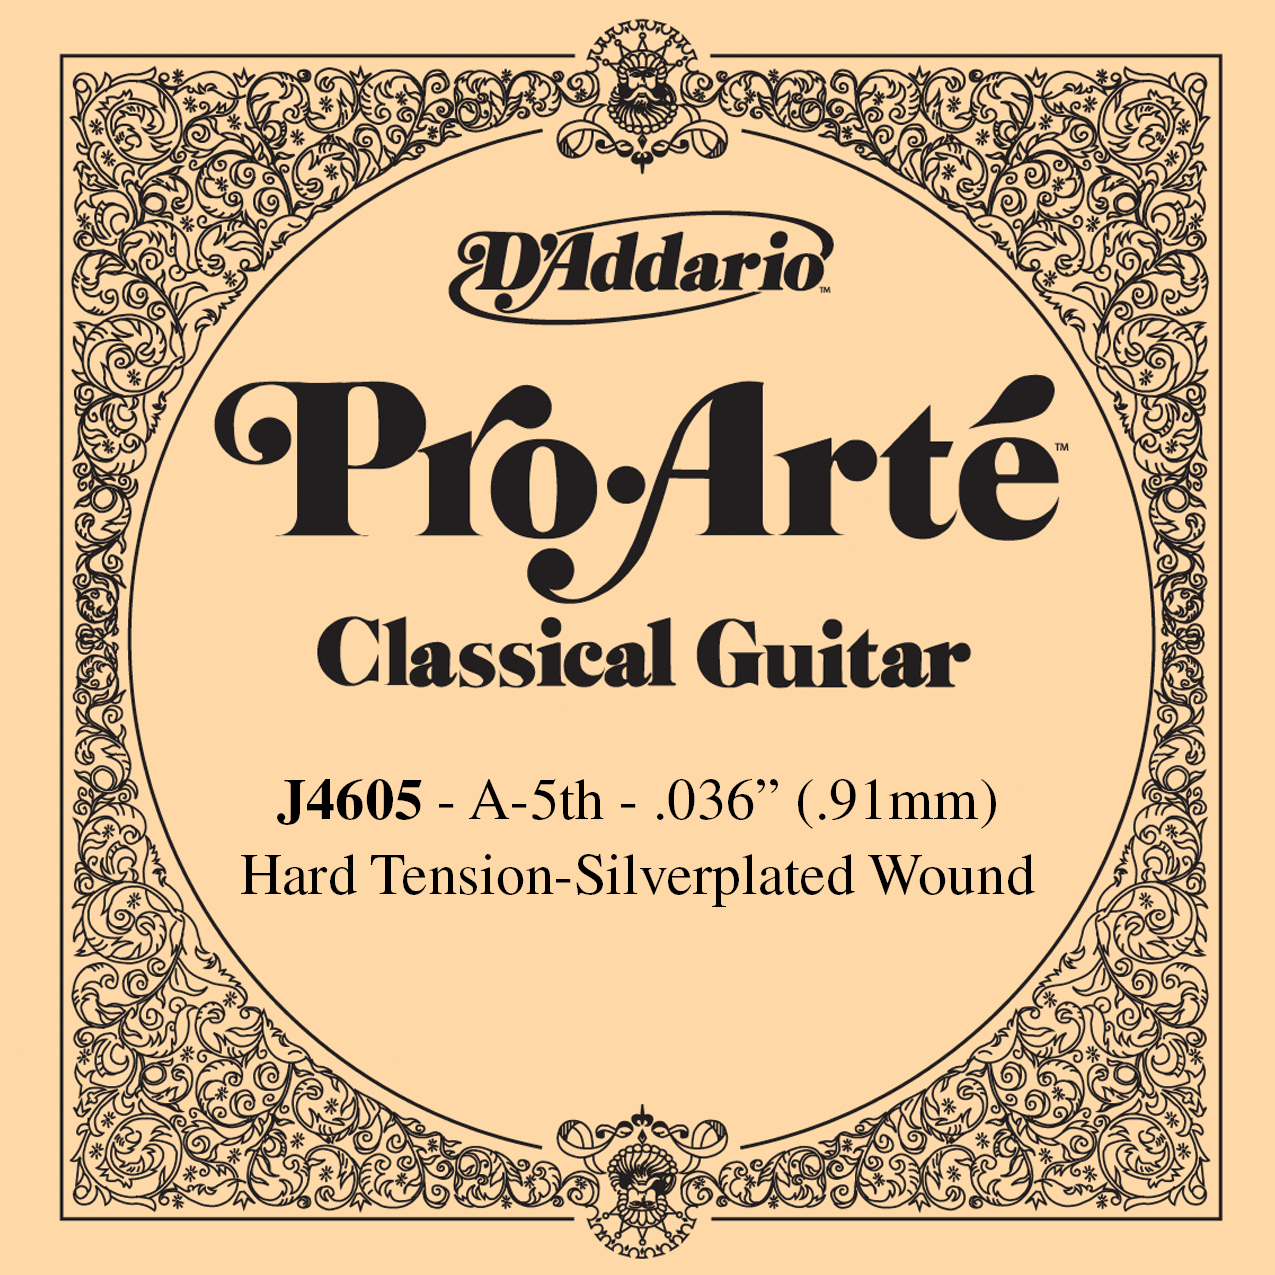 D'Addario J4605 Pro-Arte Nylon Classical Guitar Single String, Hard Tension, 5th String A